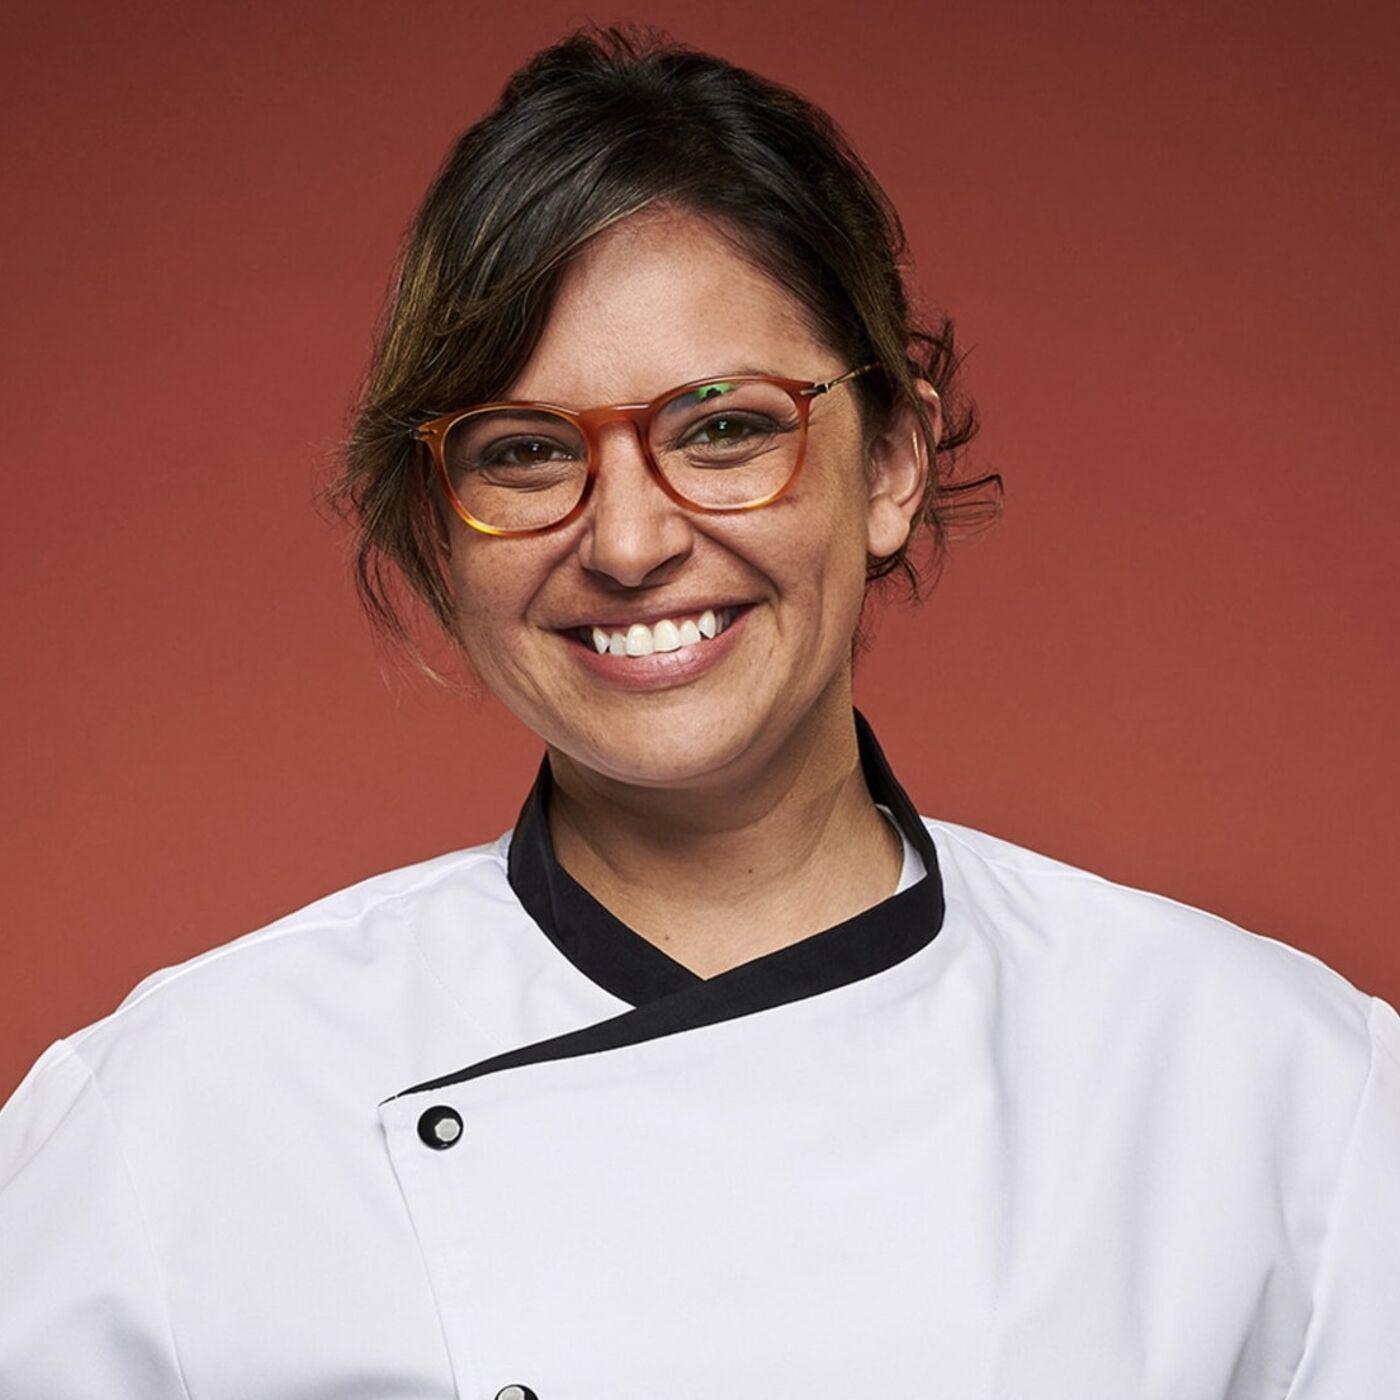 Episode 65 with Chef Kori Sutton - Hell's Kitchen Season 19 Winner, Mama Kori Salsa, Super Mom